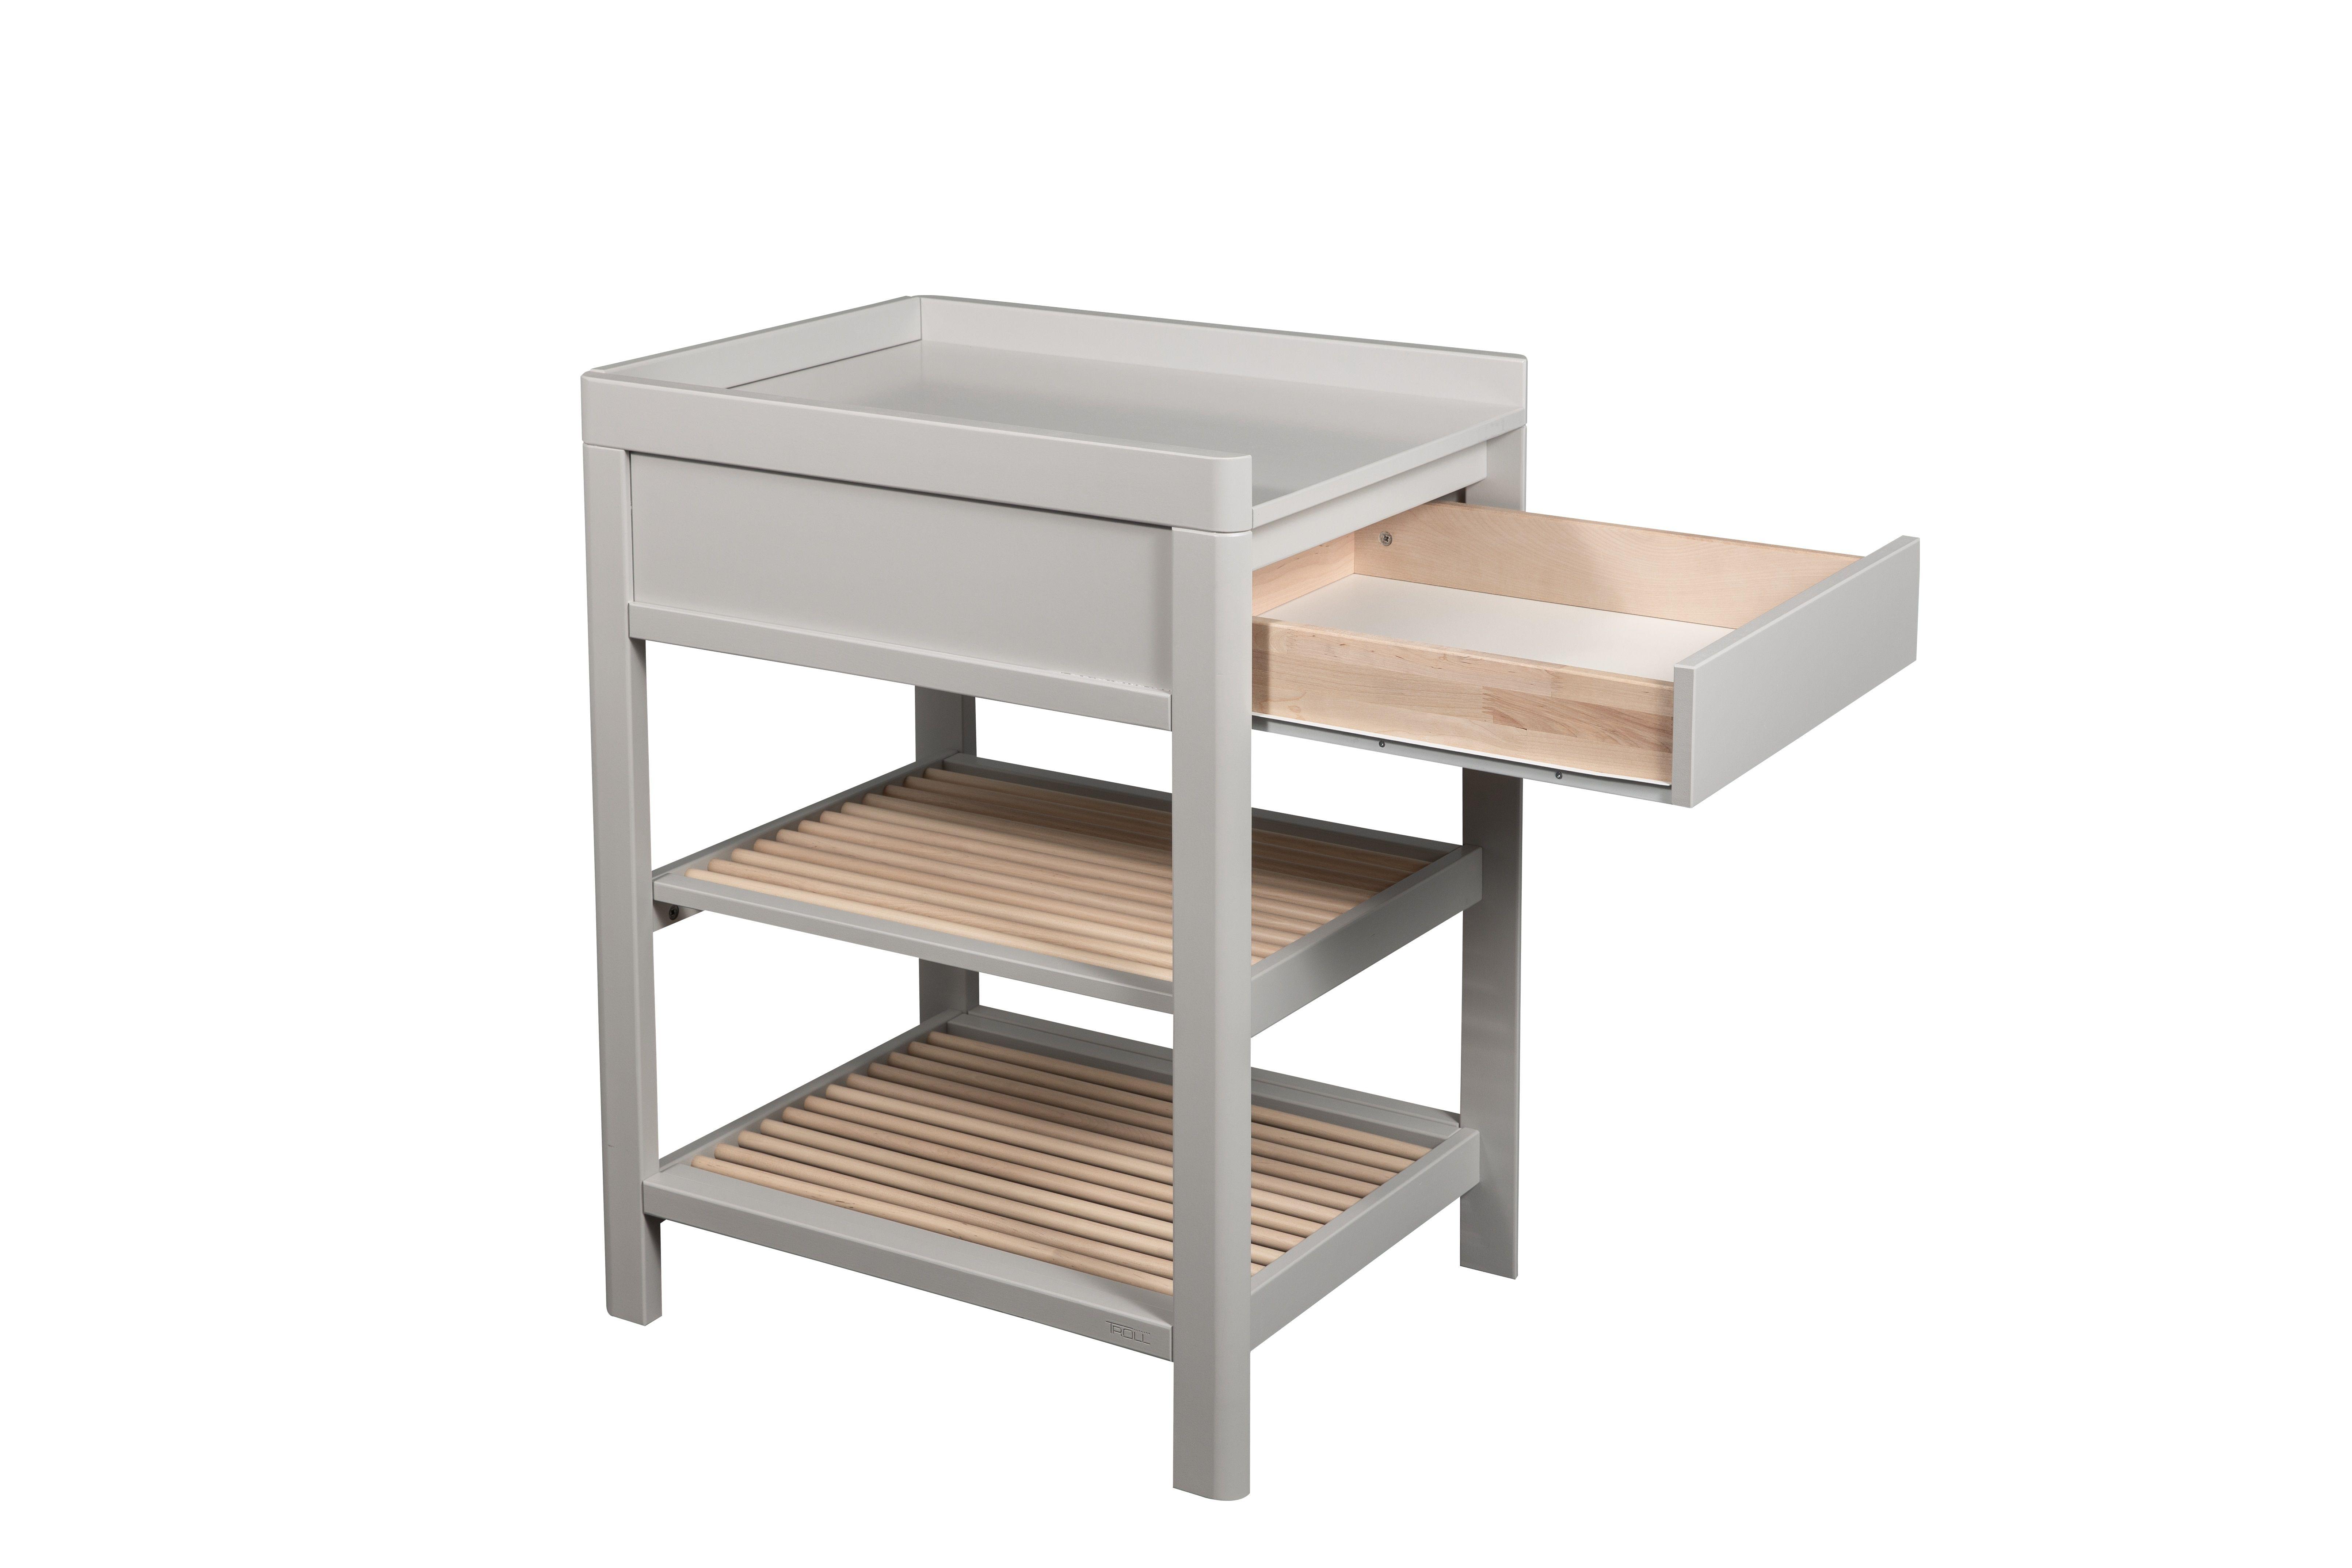 Bērnu pārtinamais galds ar atvilktni TROLL Lukas Warm grey Natural CTL-LU0523SFG-NA